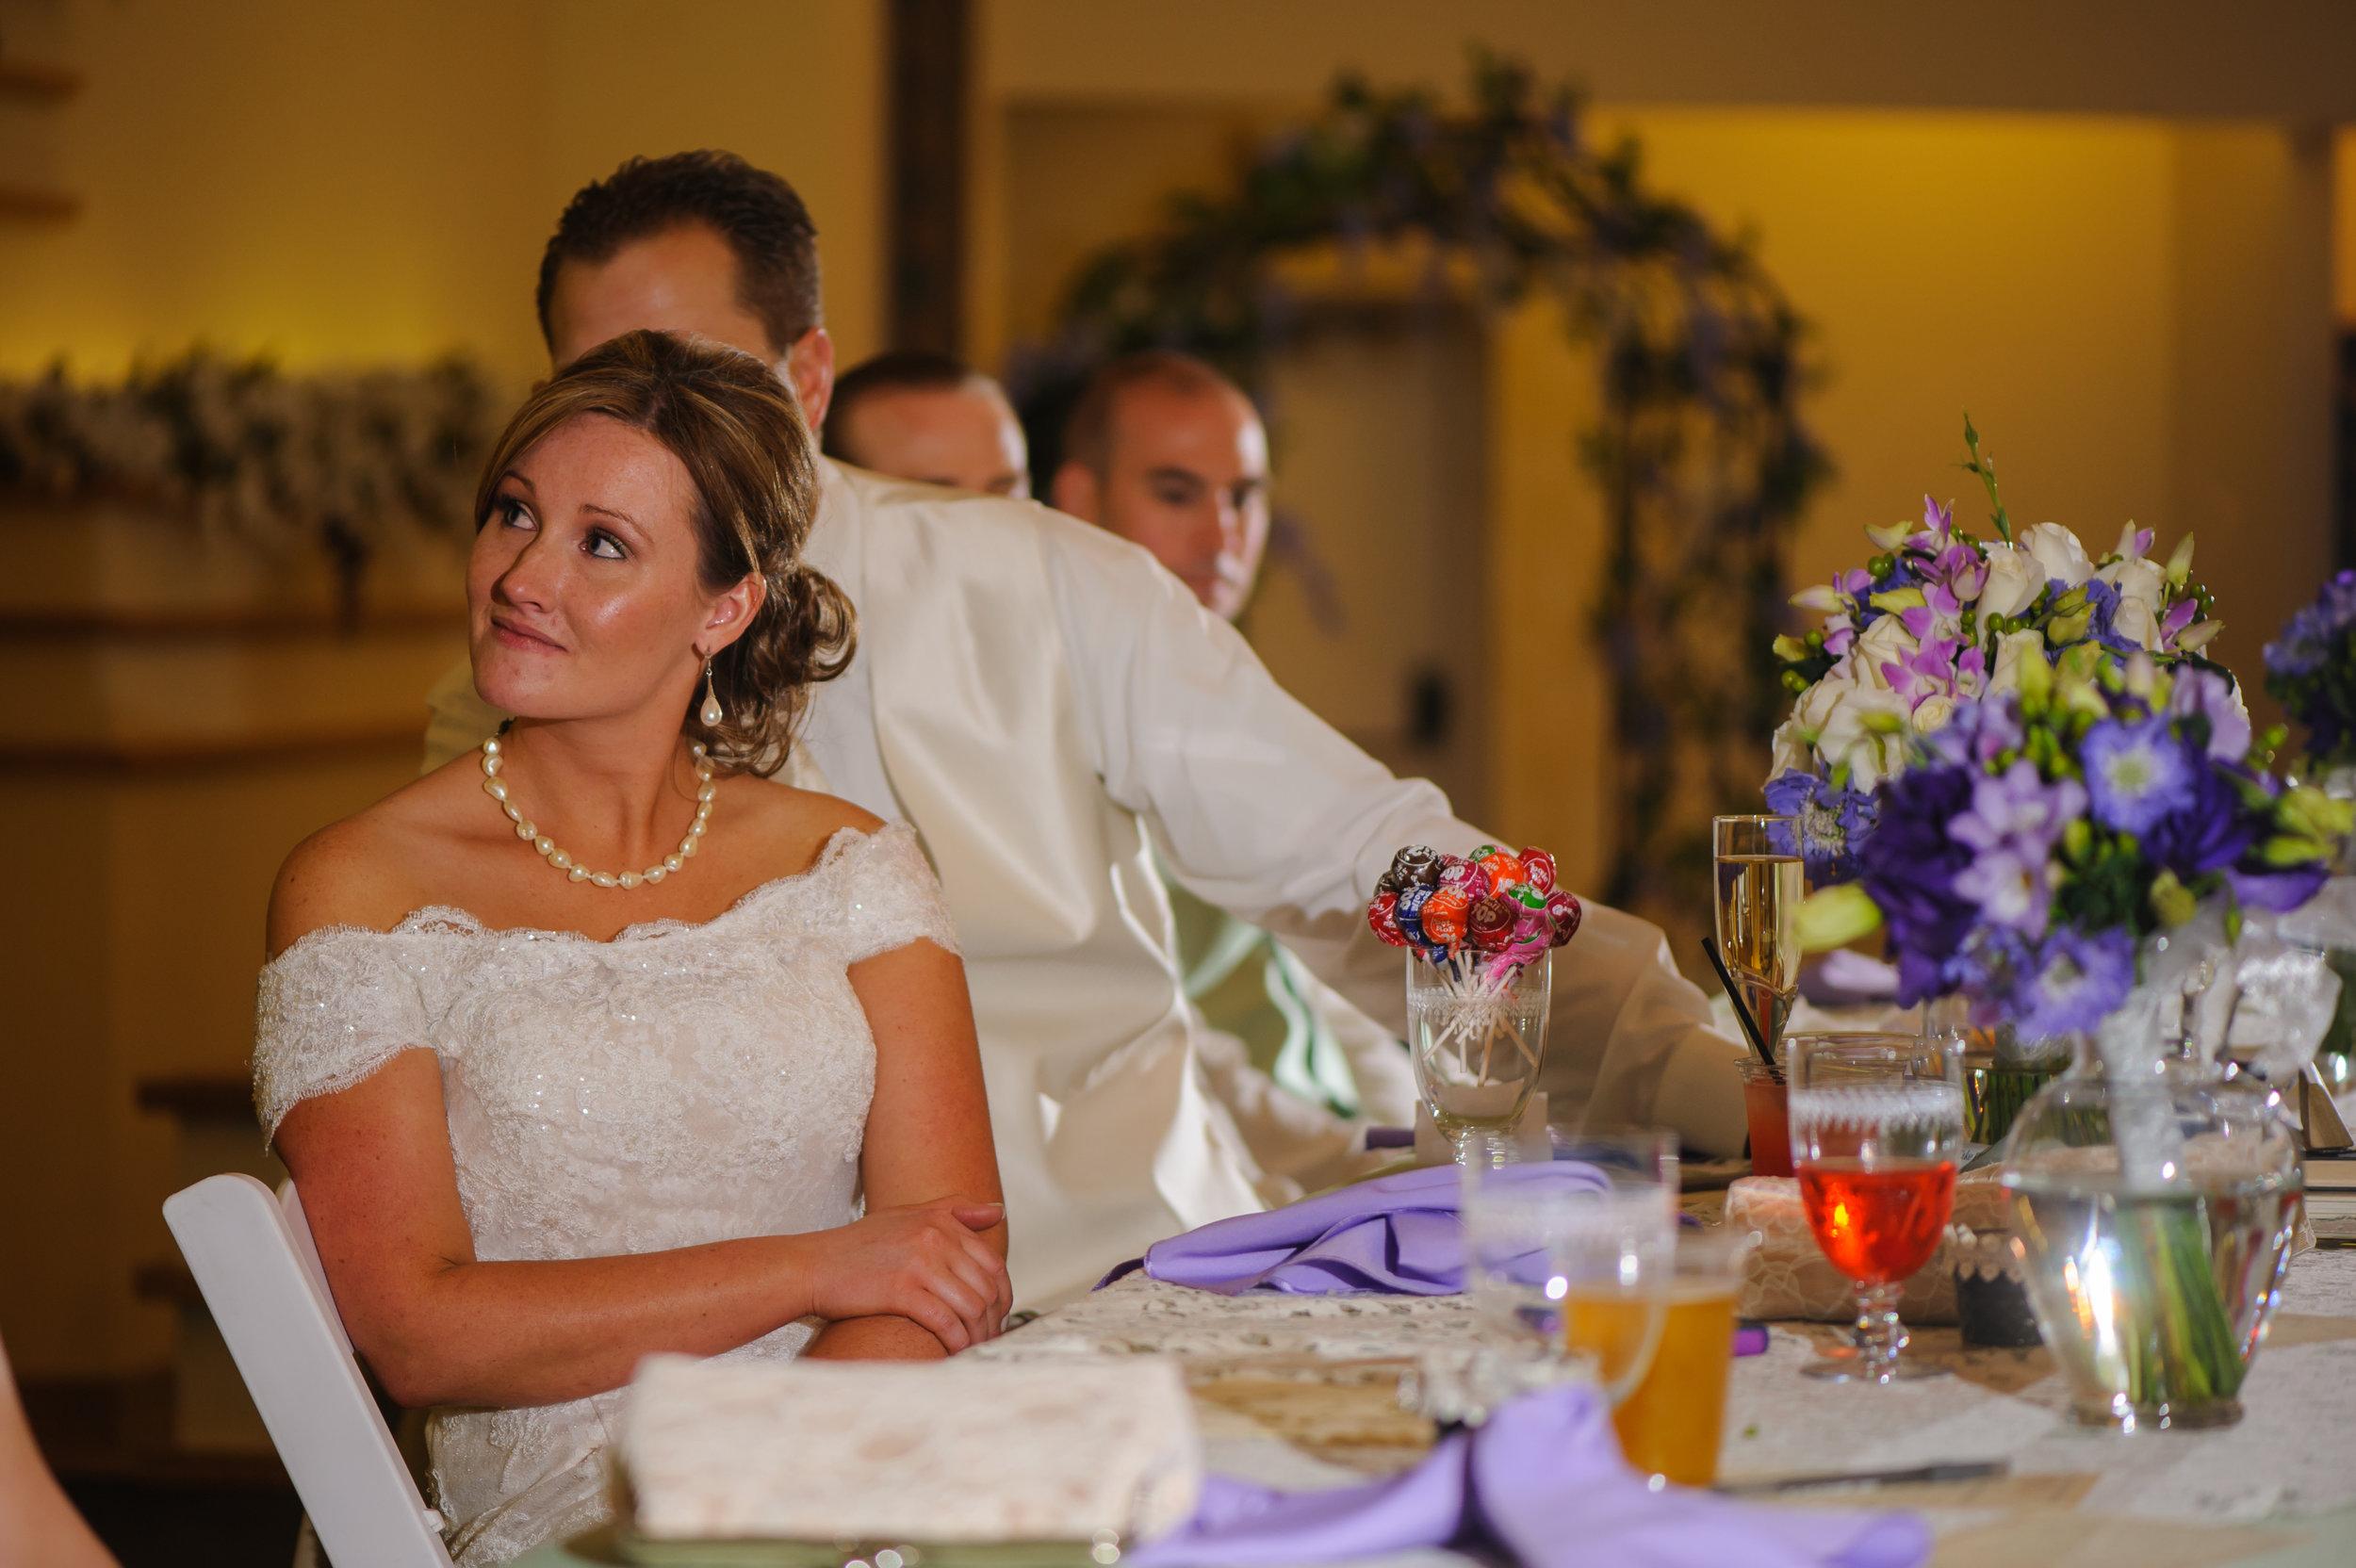 danielle-ross-027-sacramento-wedding-photographer-katherine-nicole-photography.JPG